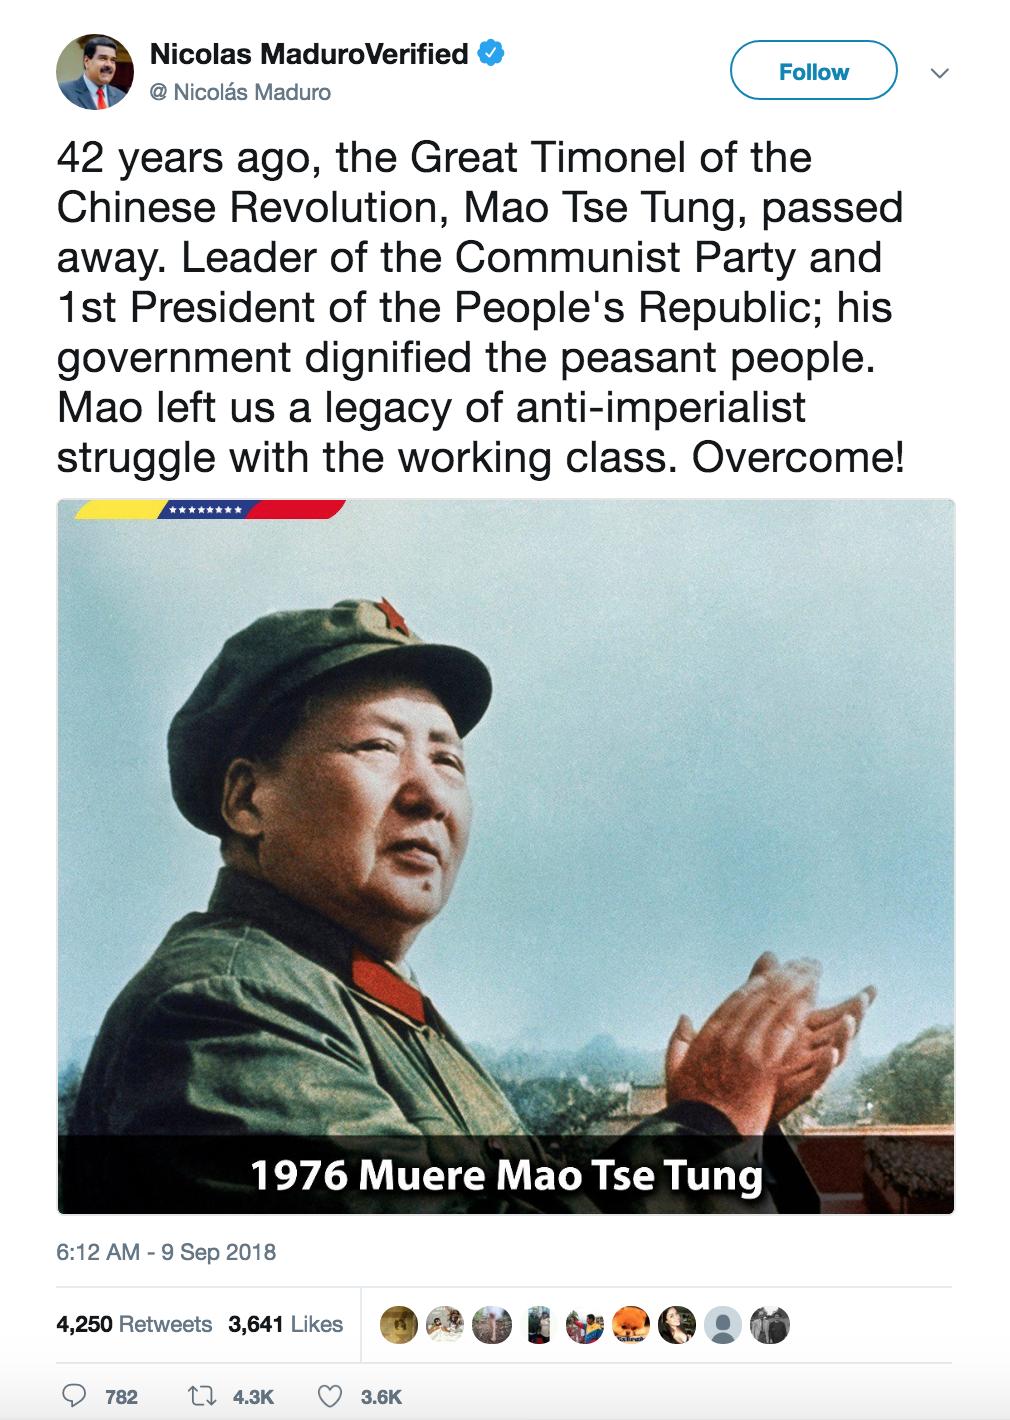 Screenshot of Venezuela President Maduro's tweet about Mao